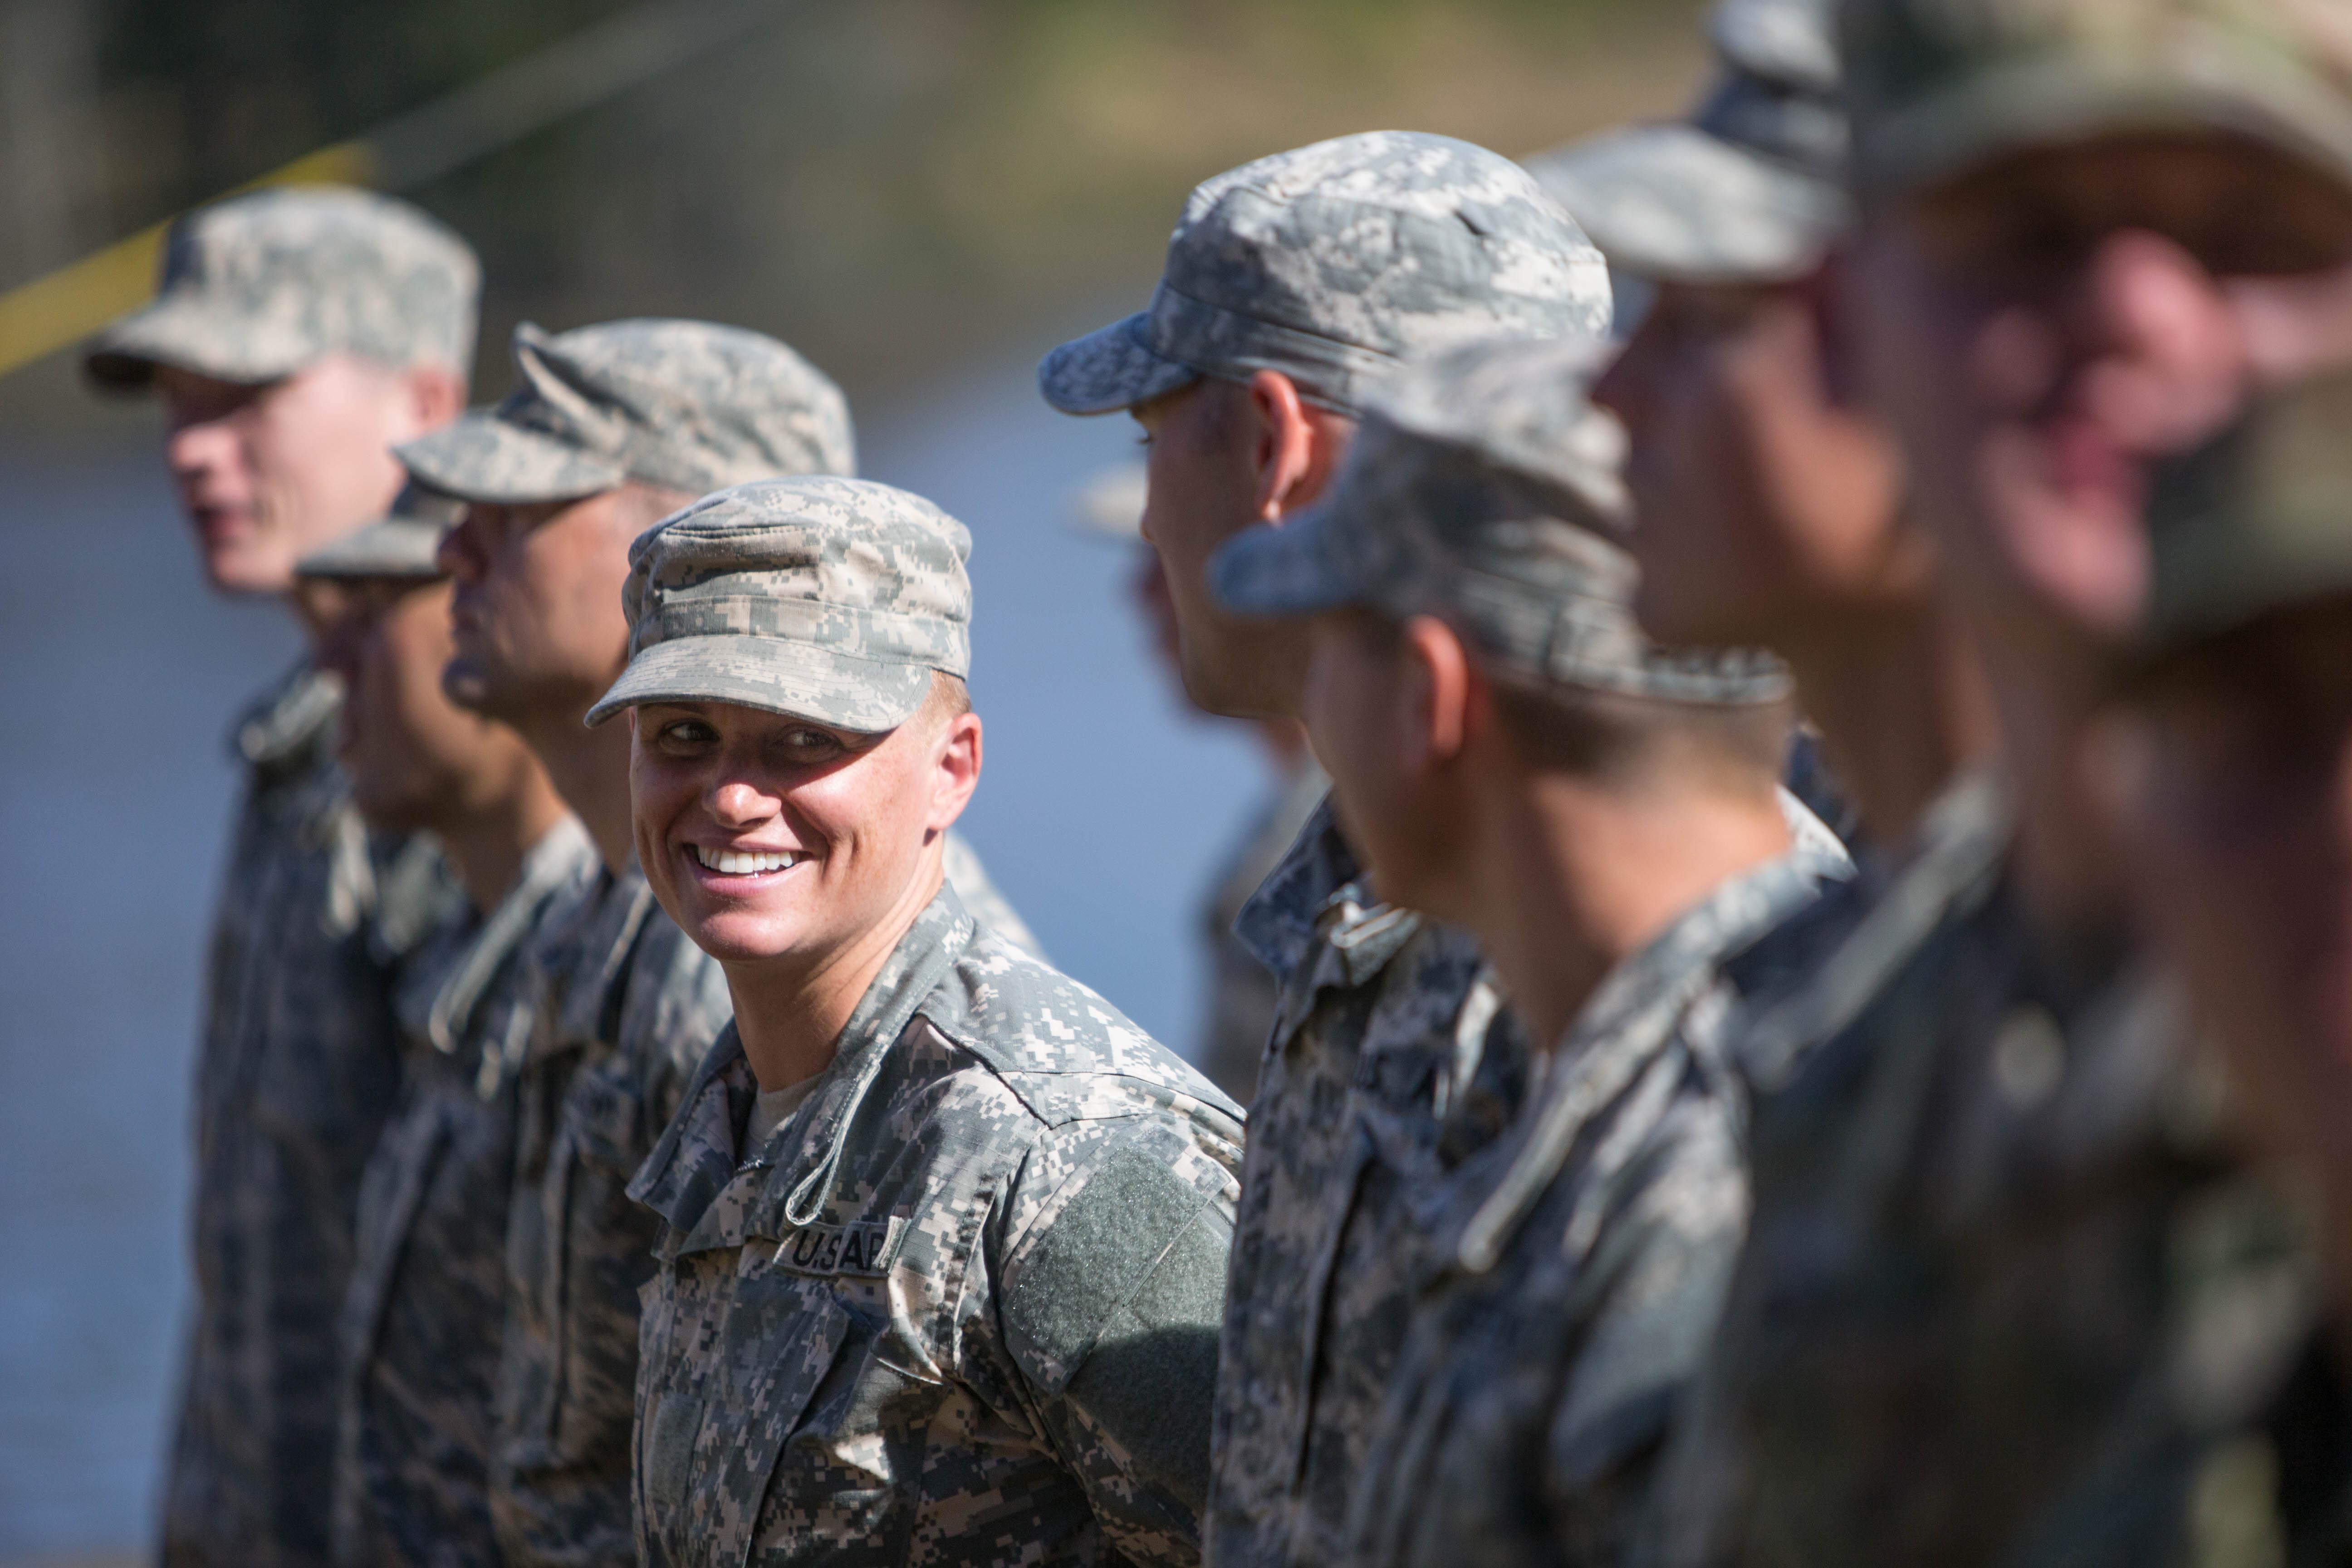 635828453457198016-Army-Rangers-Women-020b2